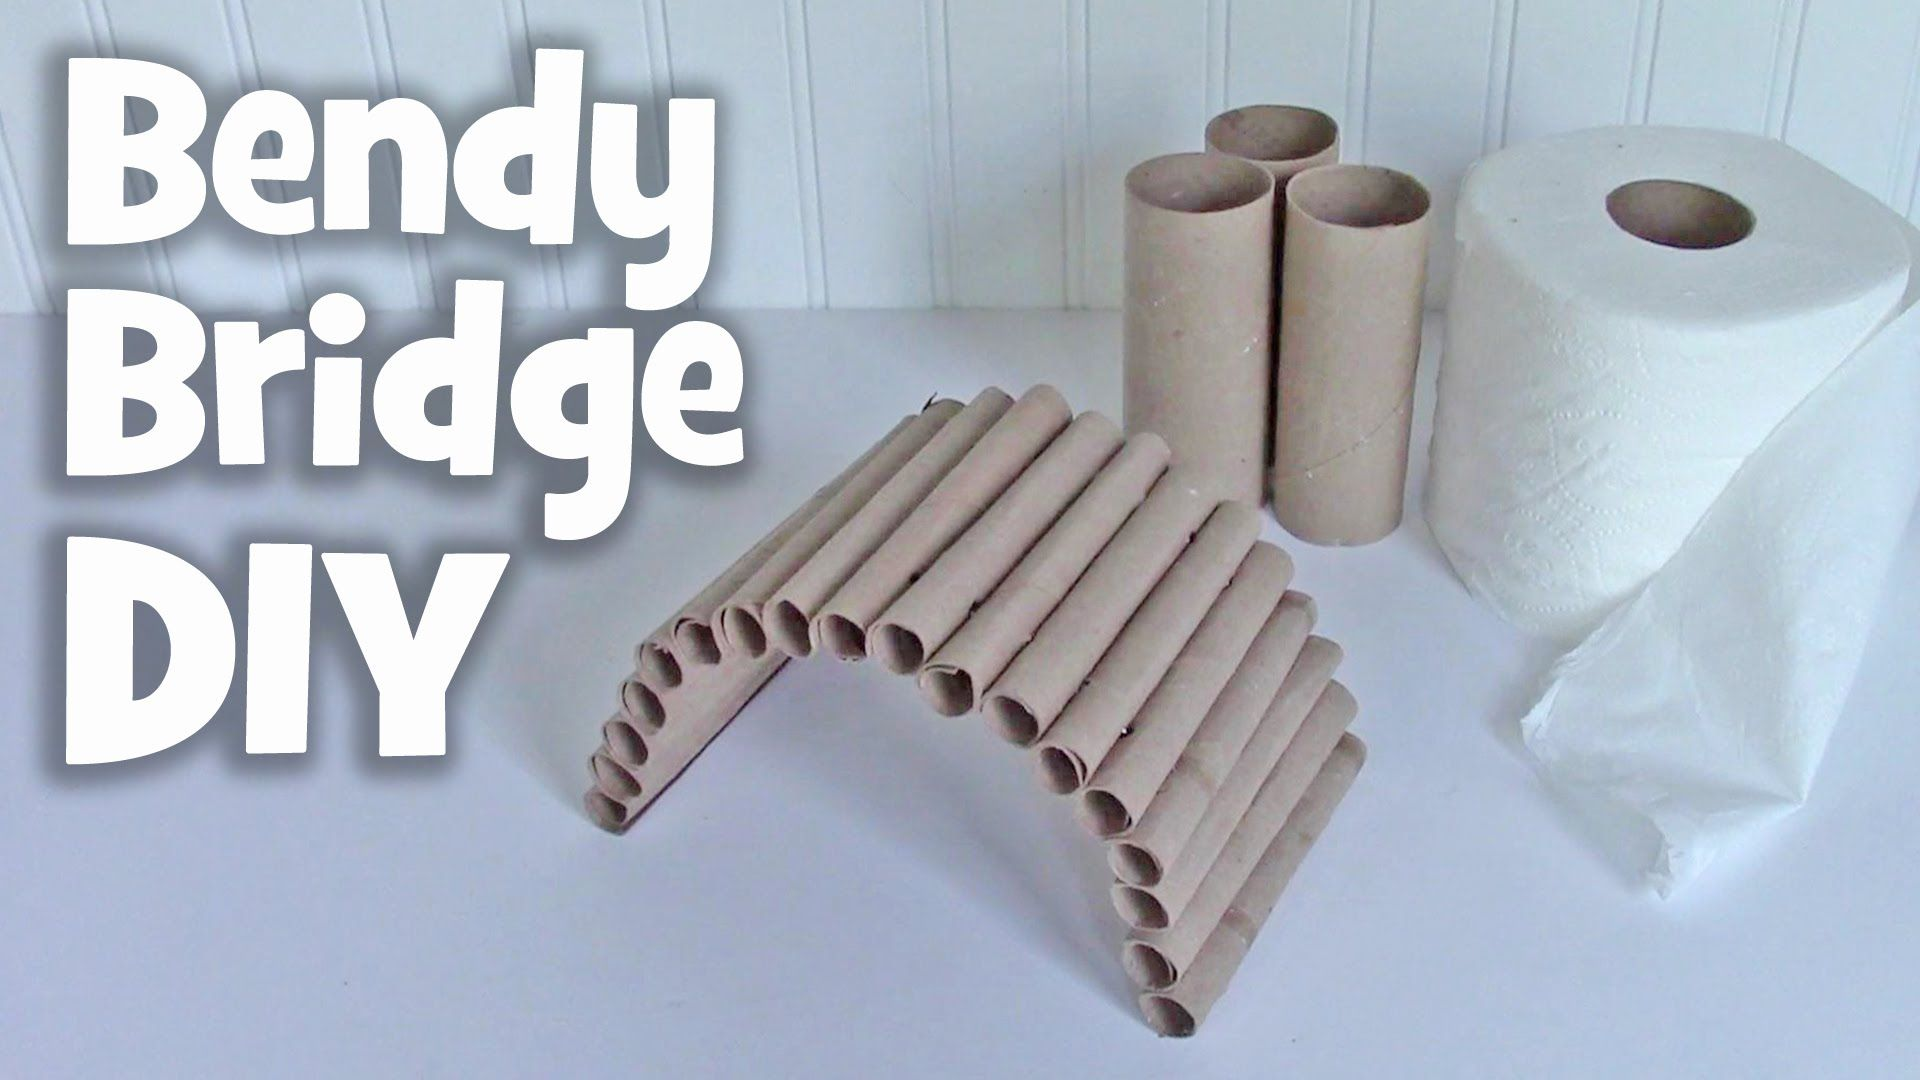 DIY Bendy Bridge by Hammy Time Best Guinea Pig Board